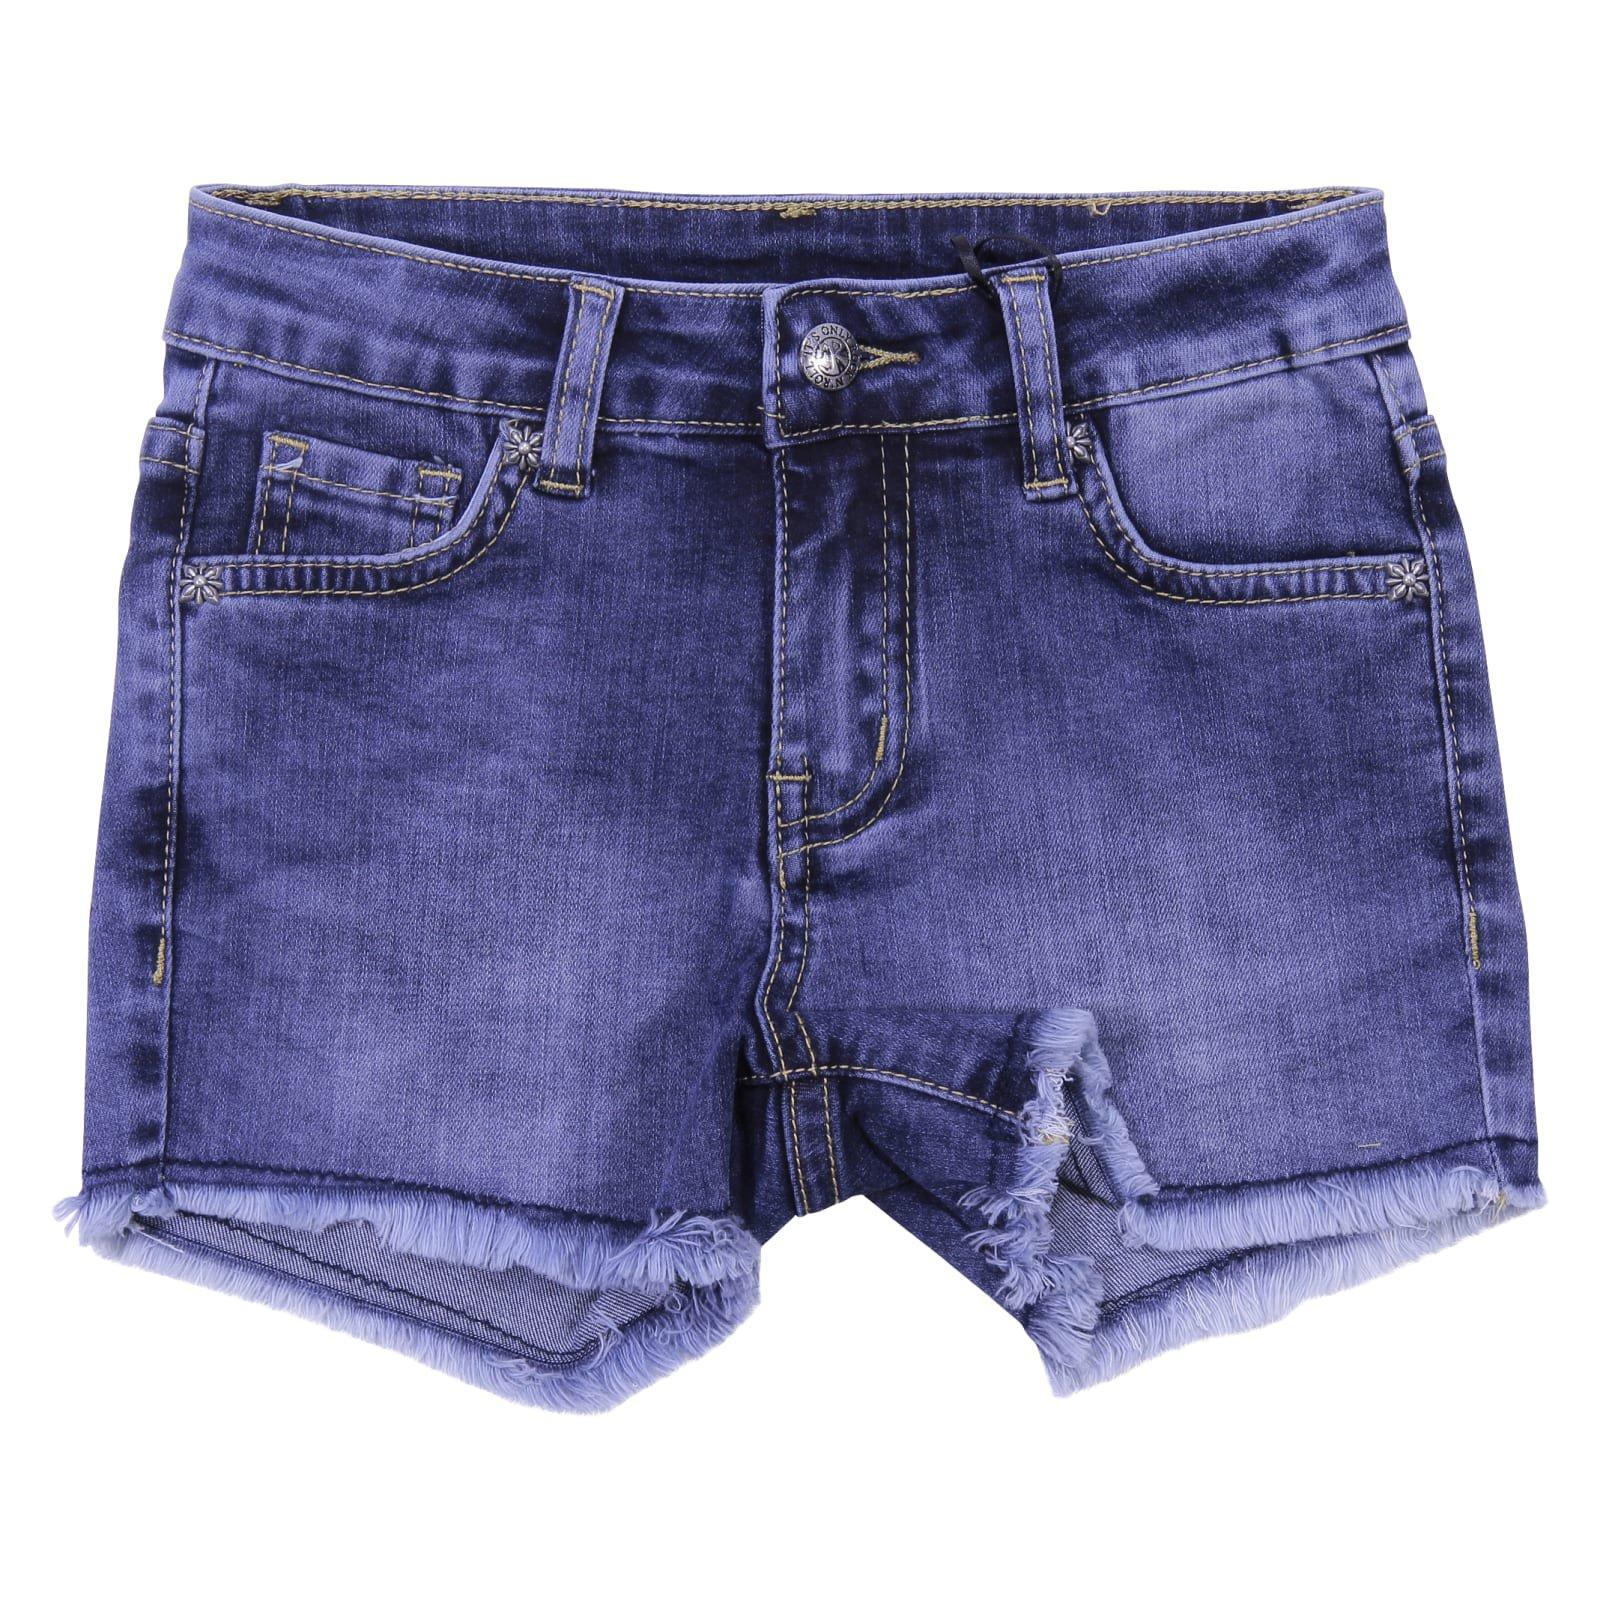 John Richmond Blue Cotton Denim Shorts